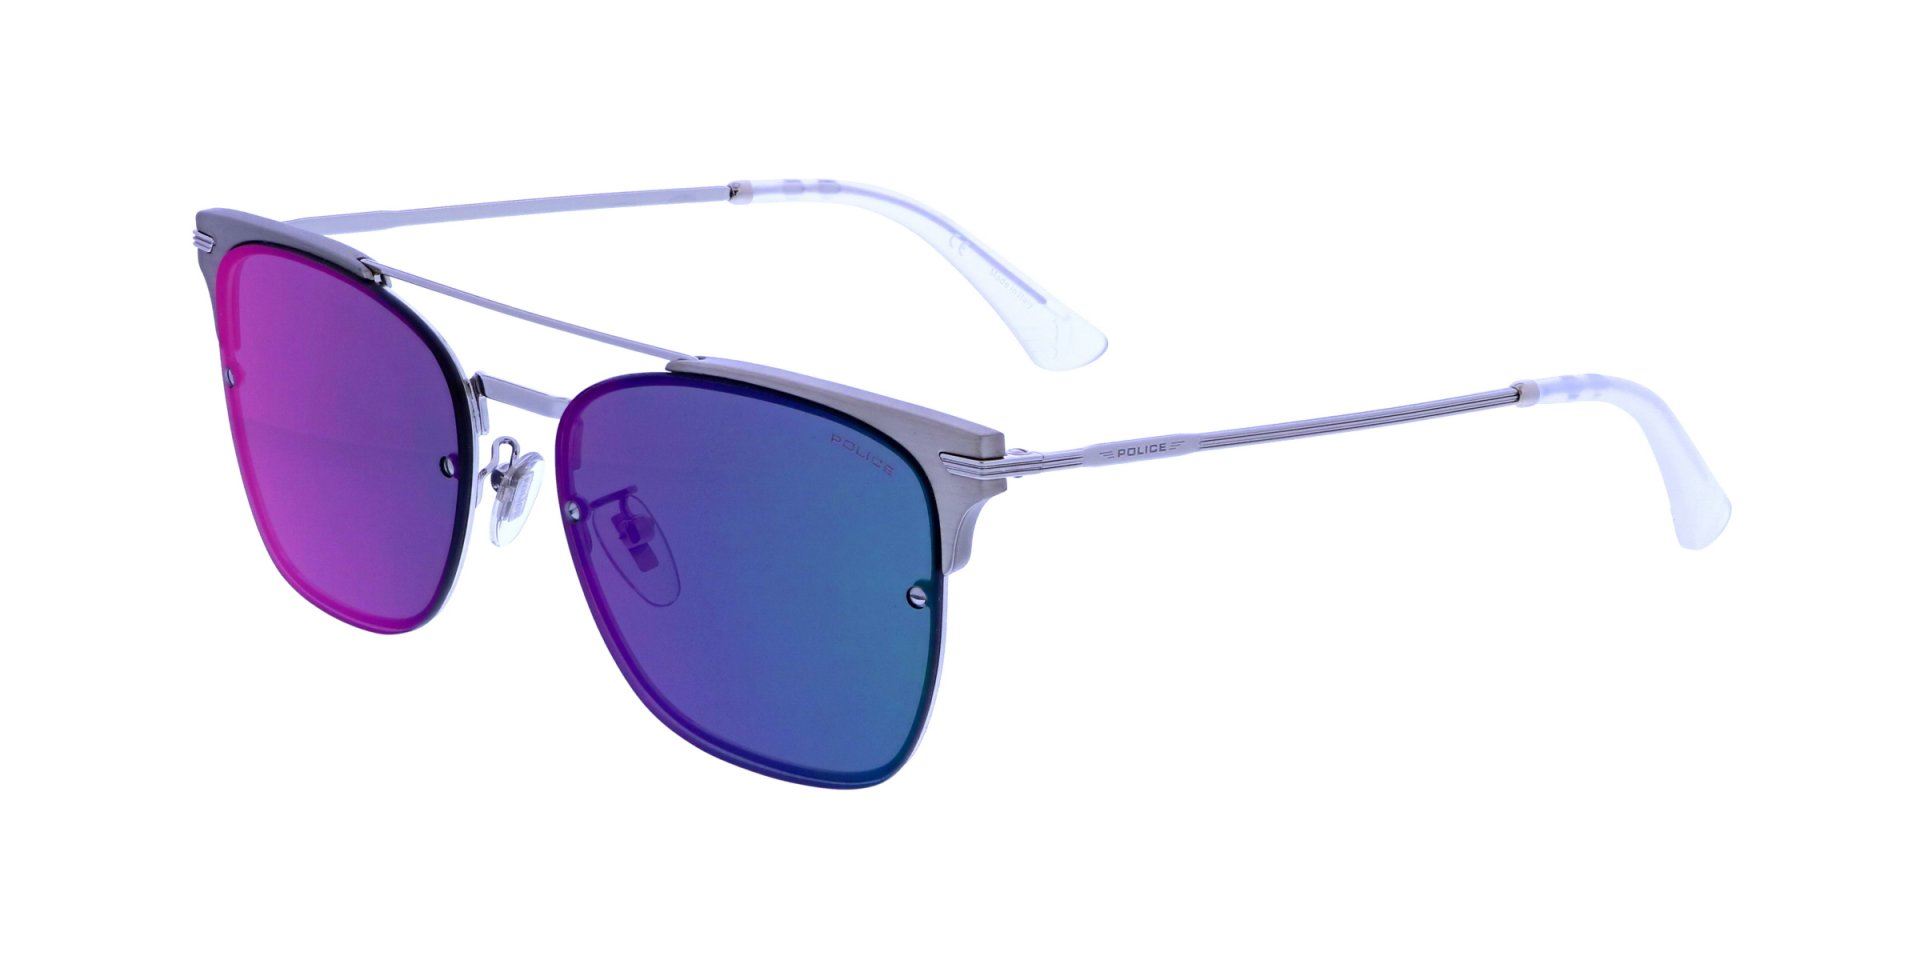 004c14328d0 Sunglasses POLICE